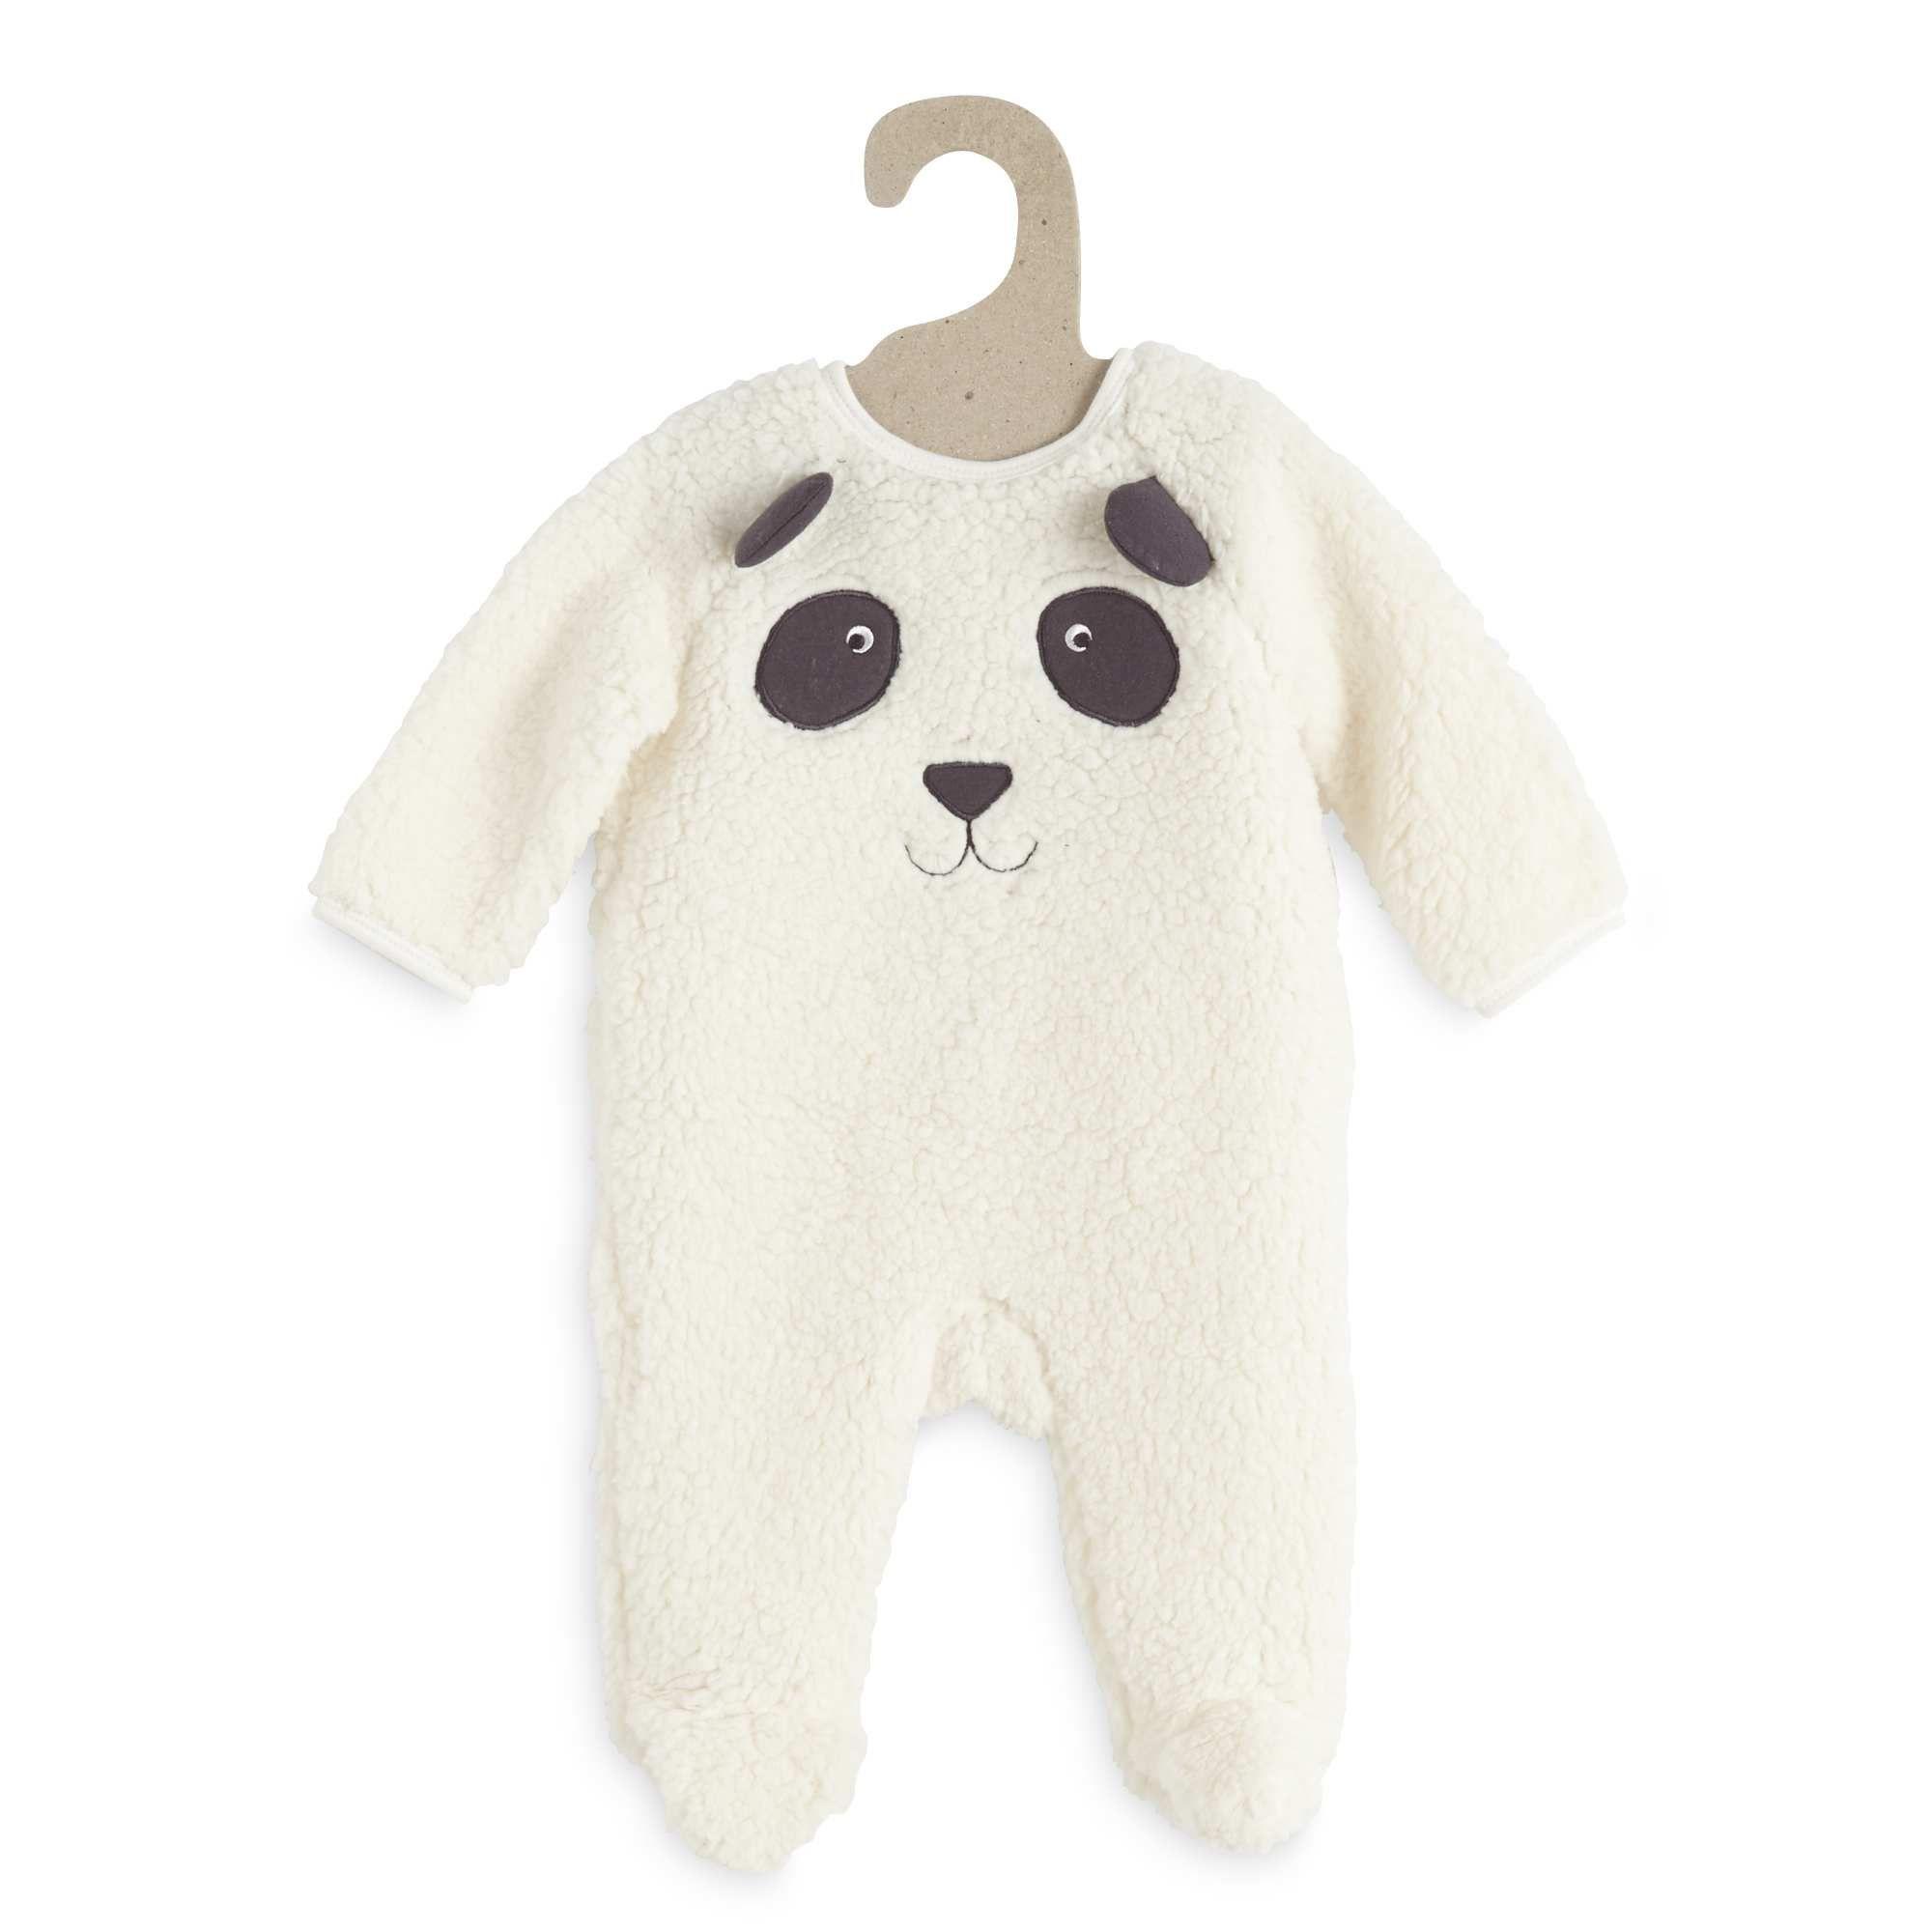 0c4f8a833a0 Sobrepijama de borreguito con cabeza de oso panda Bebé niño - Kiabi - 12